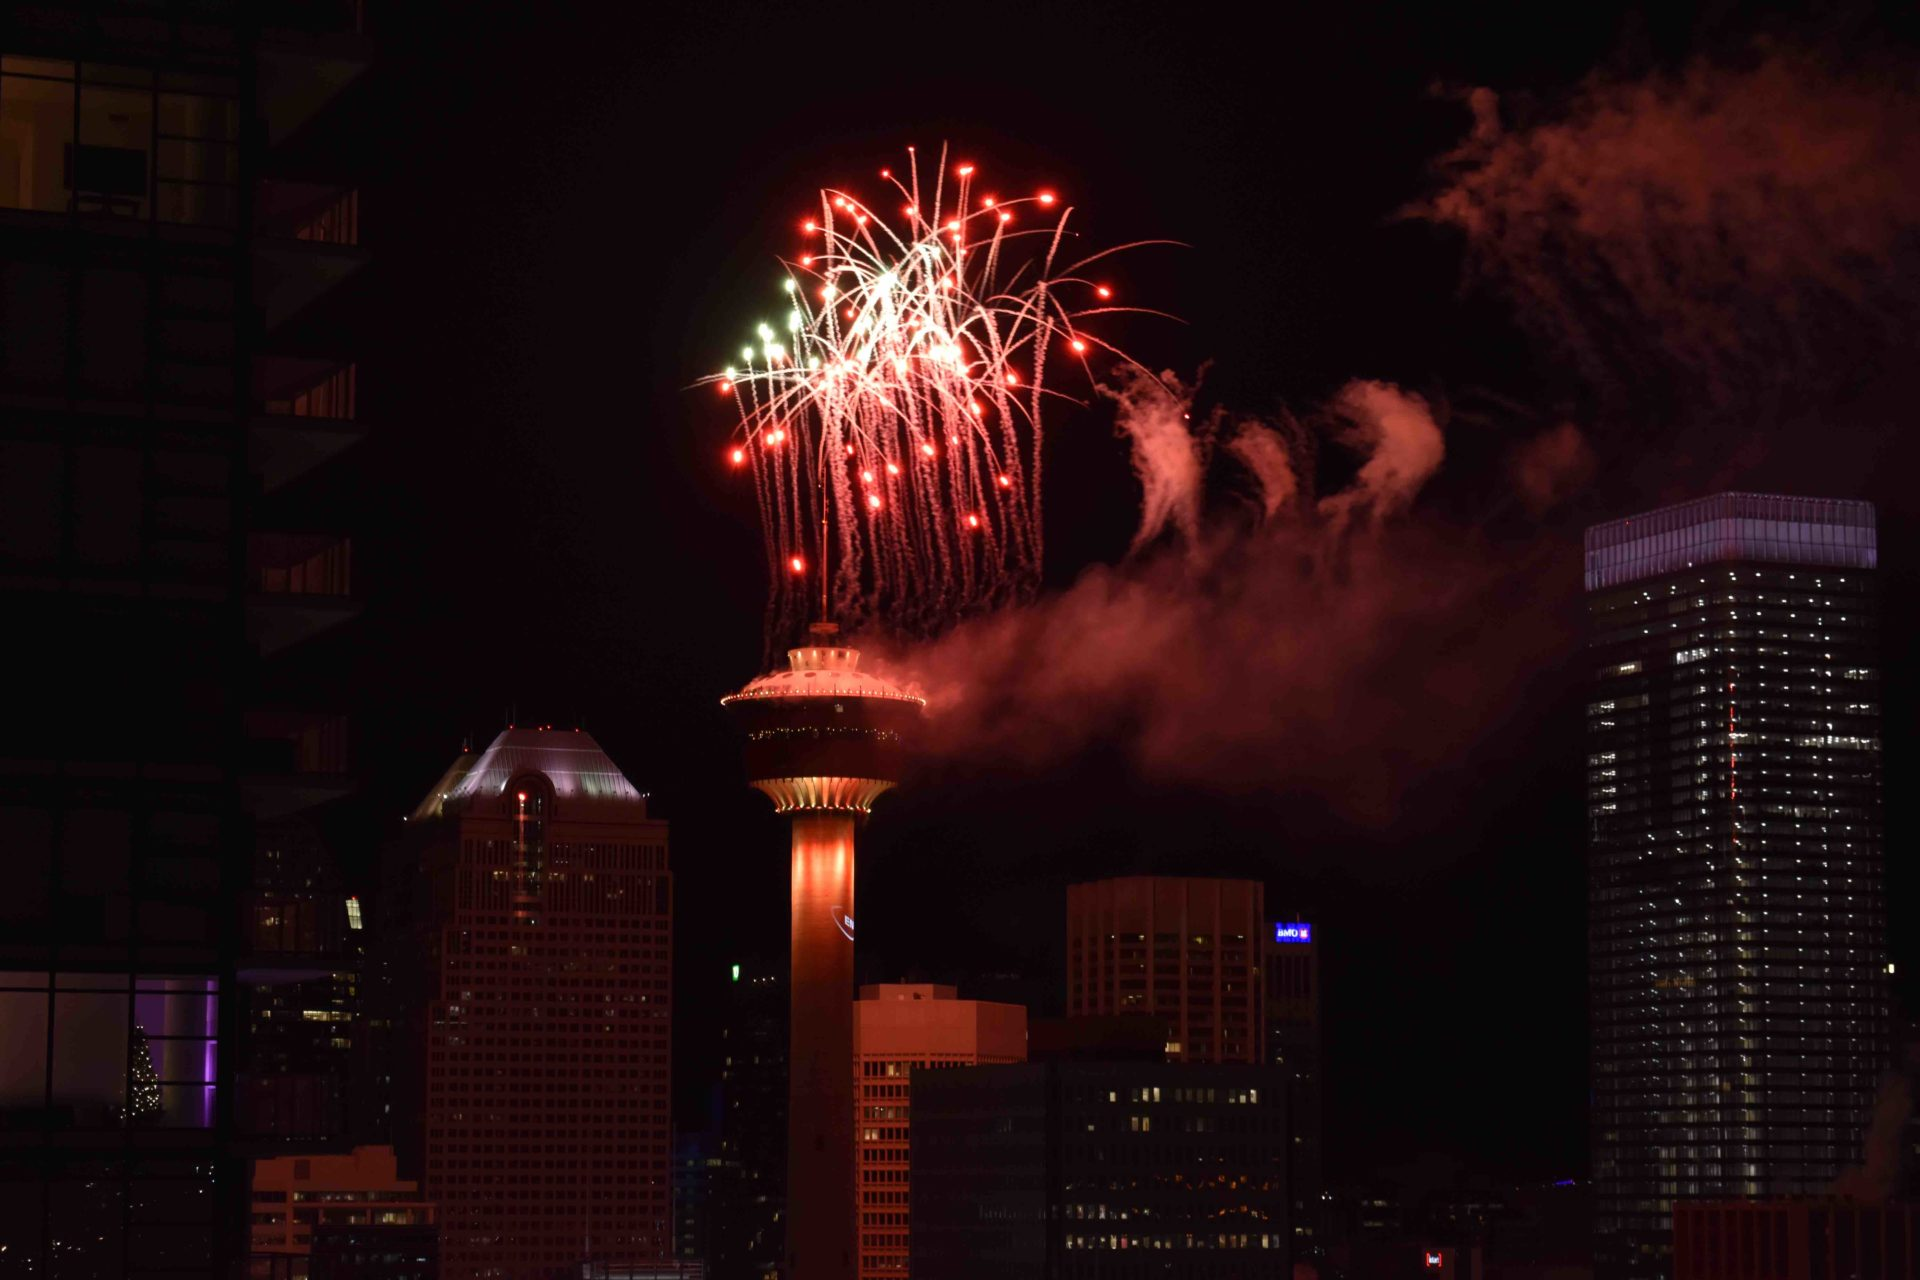 www.iamcalgary.ca I am Calgary Tower New Years 2019